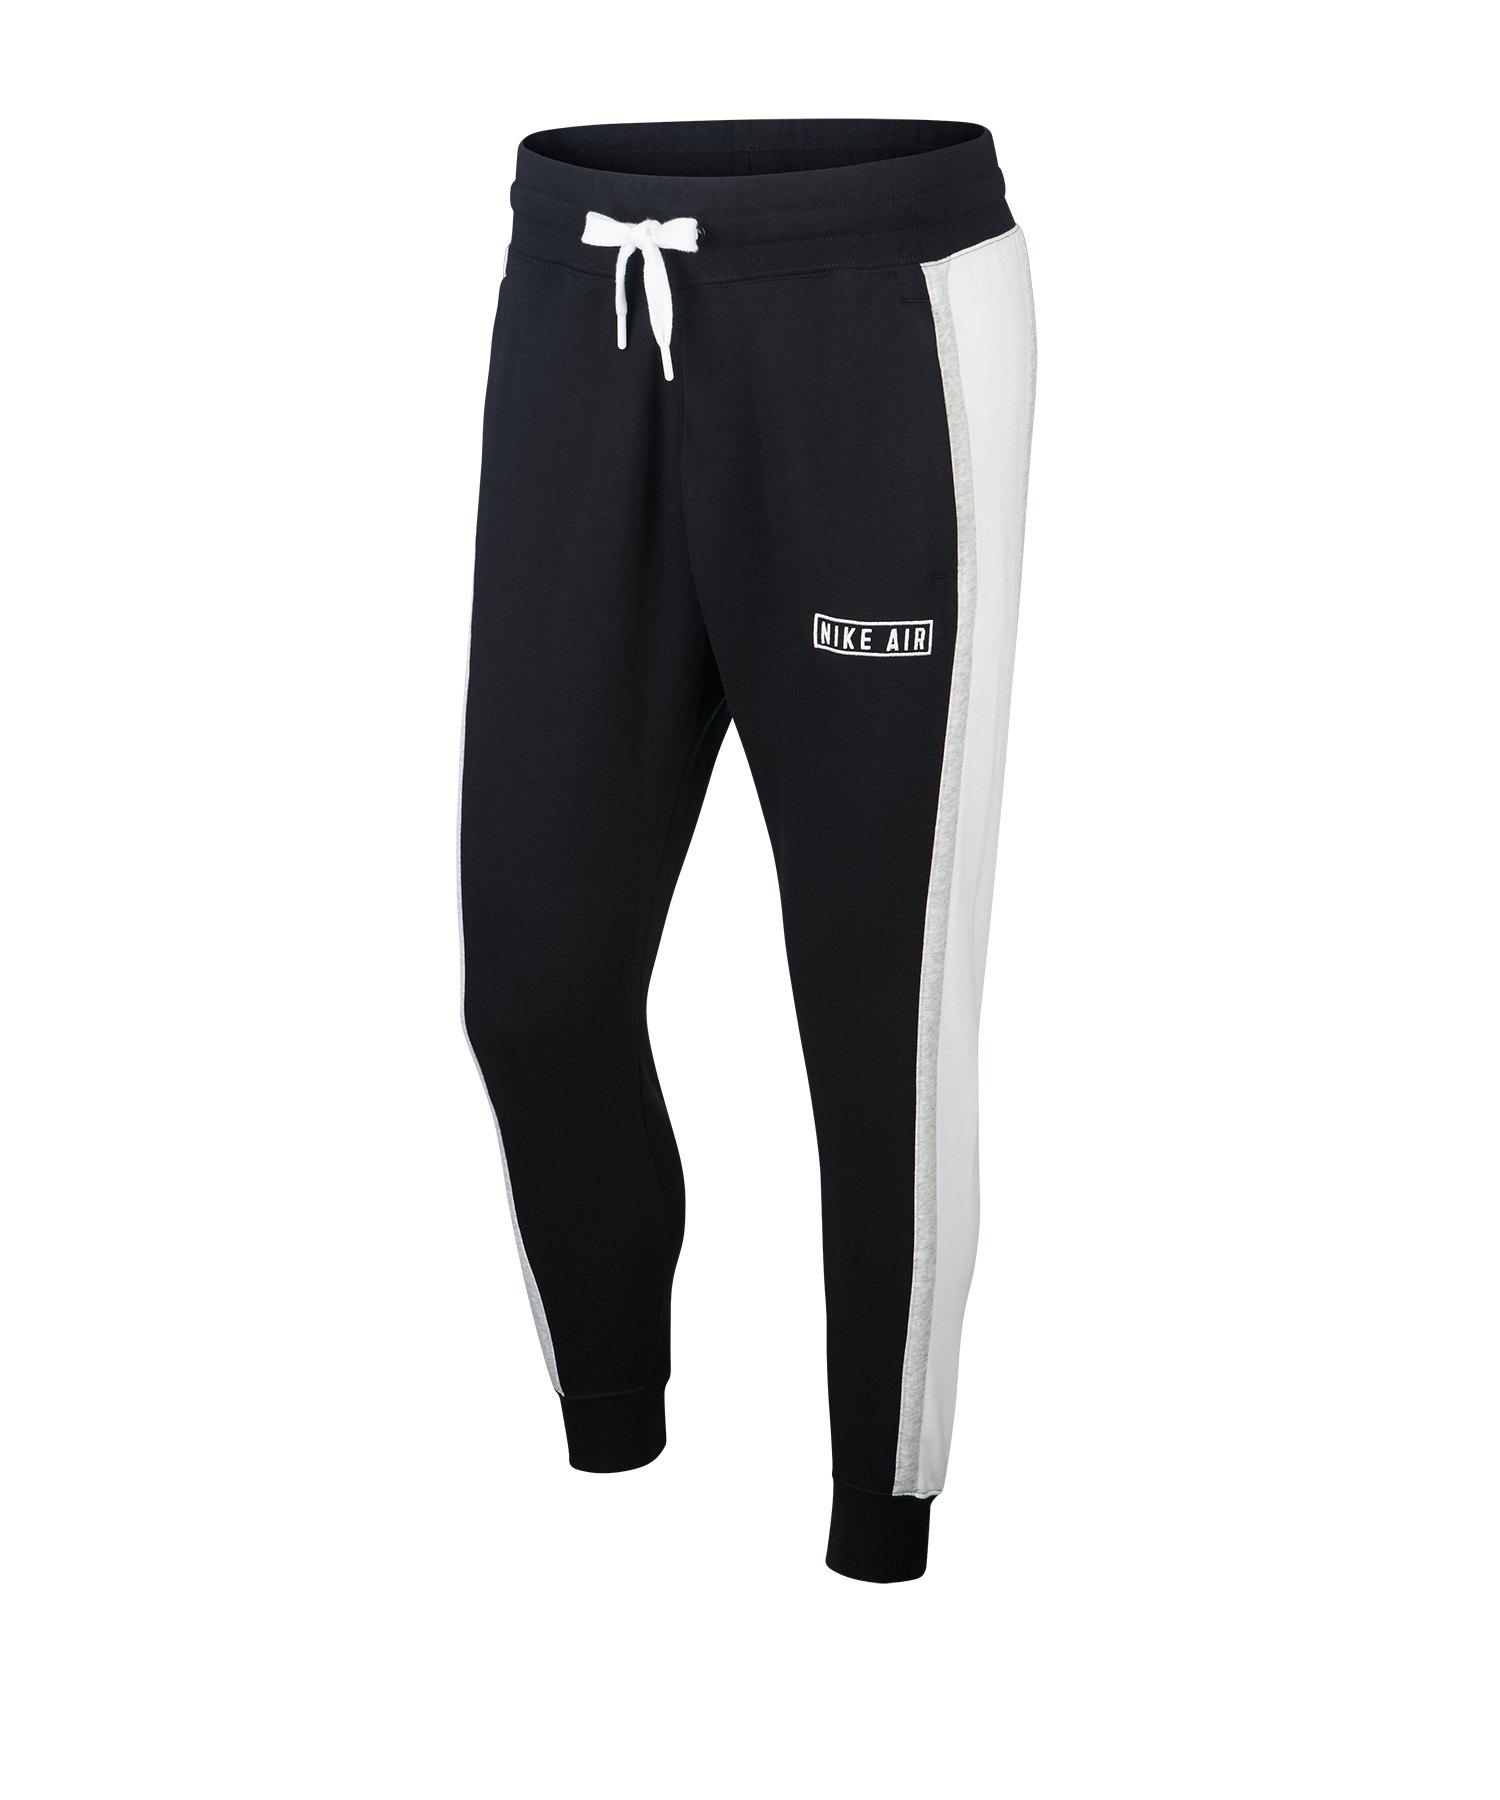 Nike Air Fleece Jogger Pant Hose Schwarz F010 - schwarz